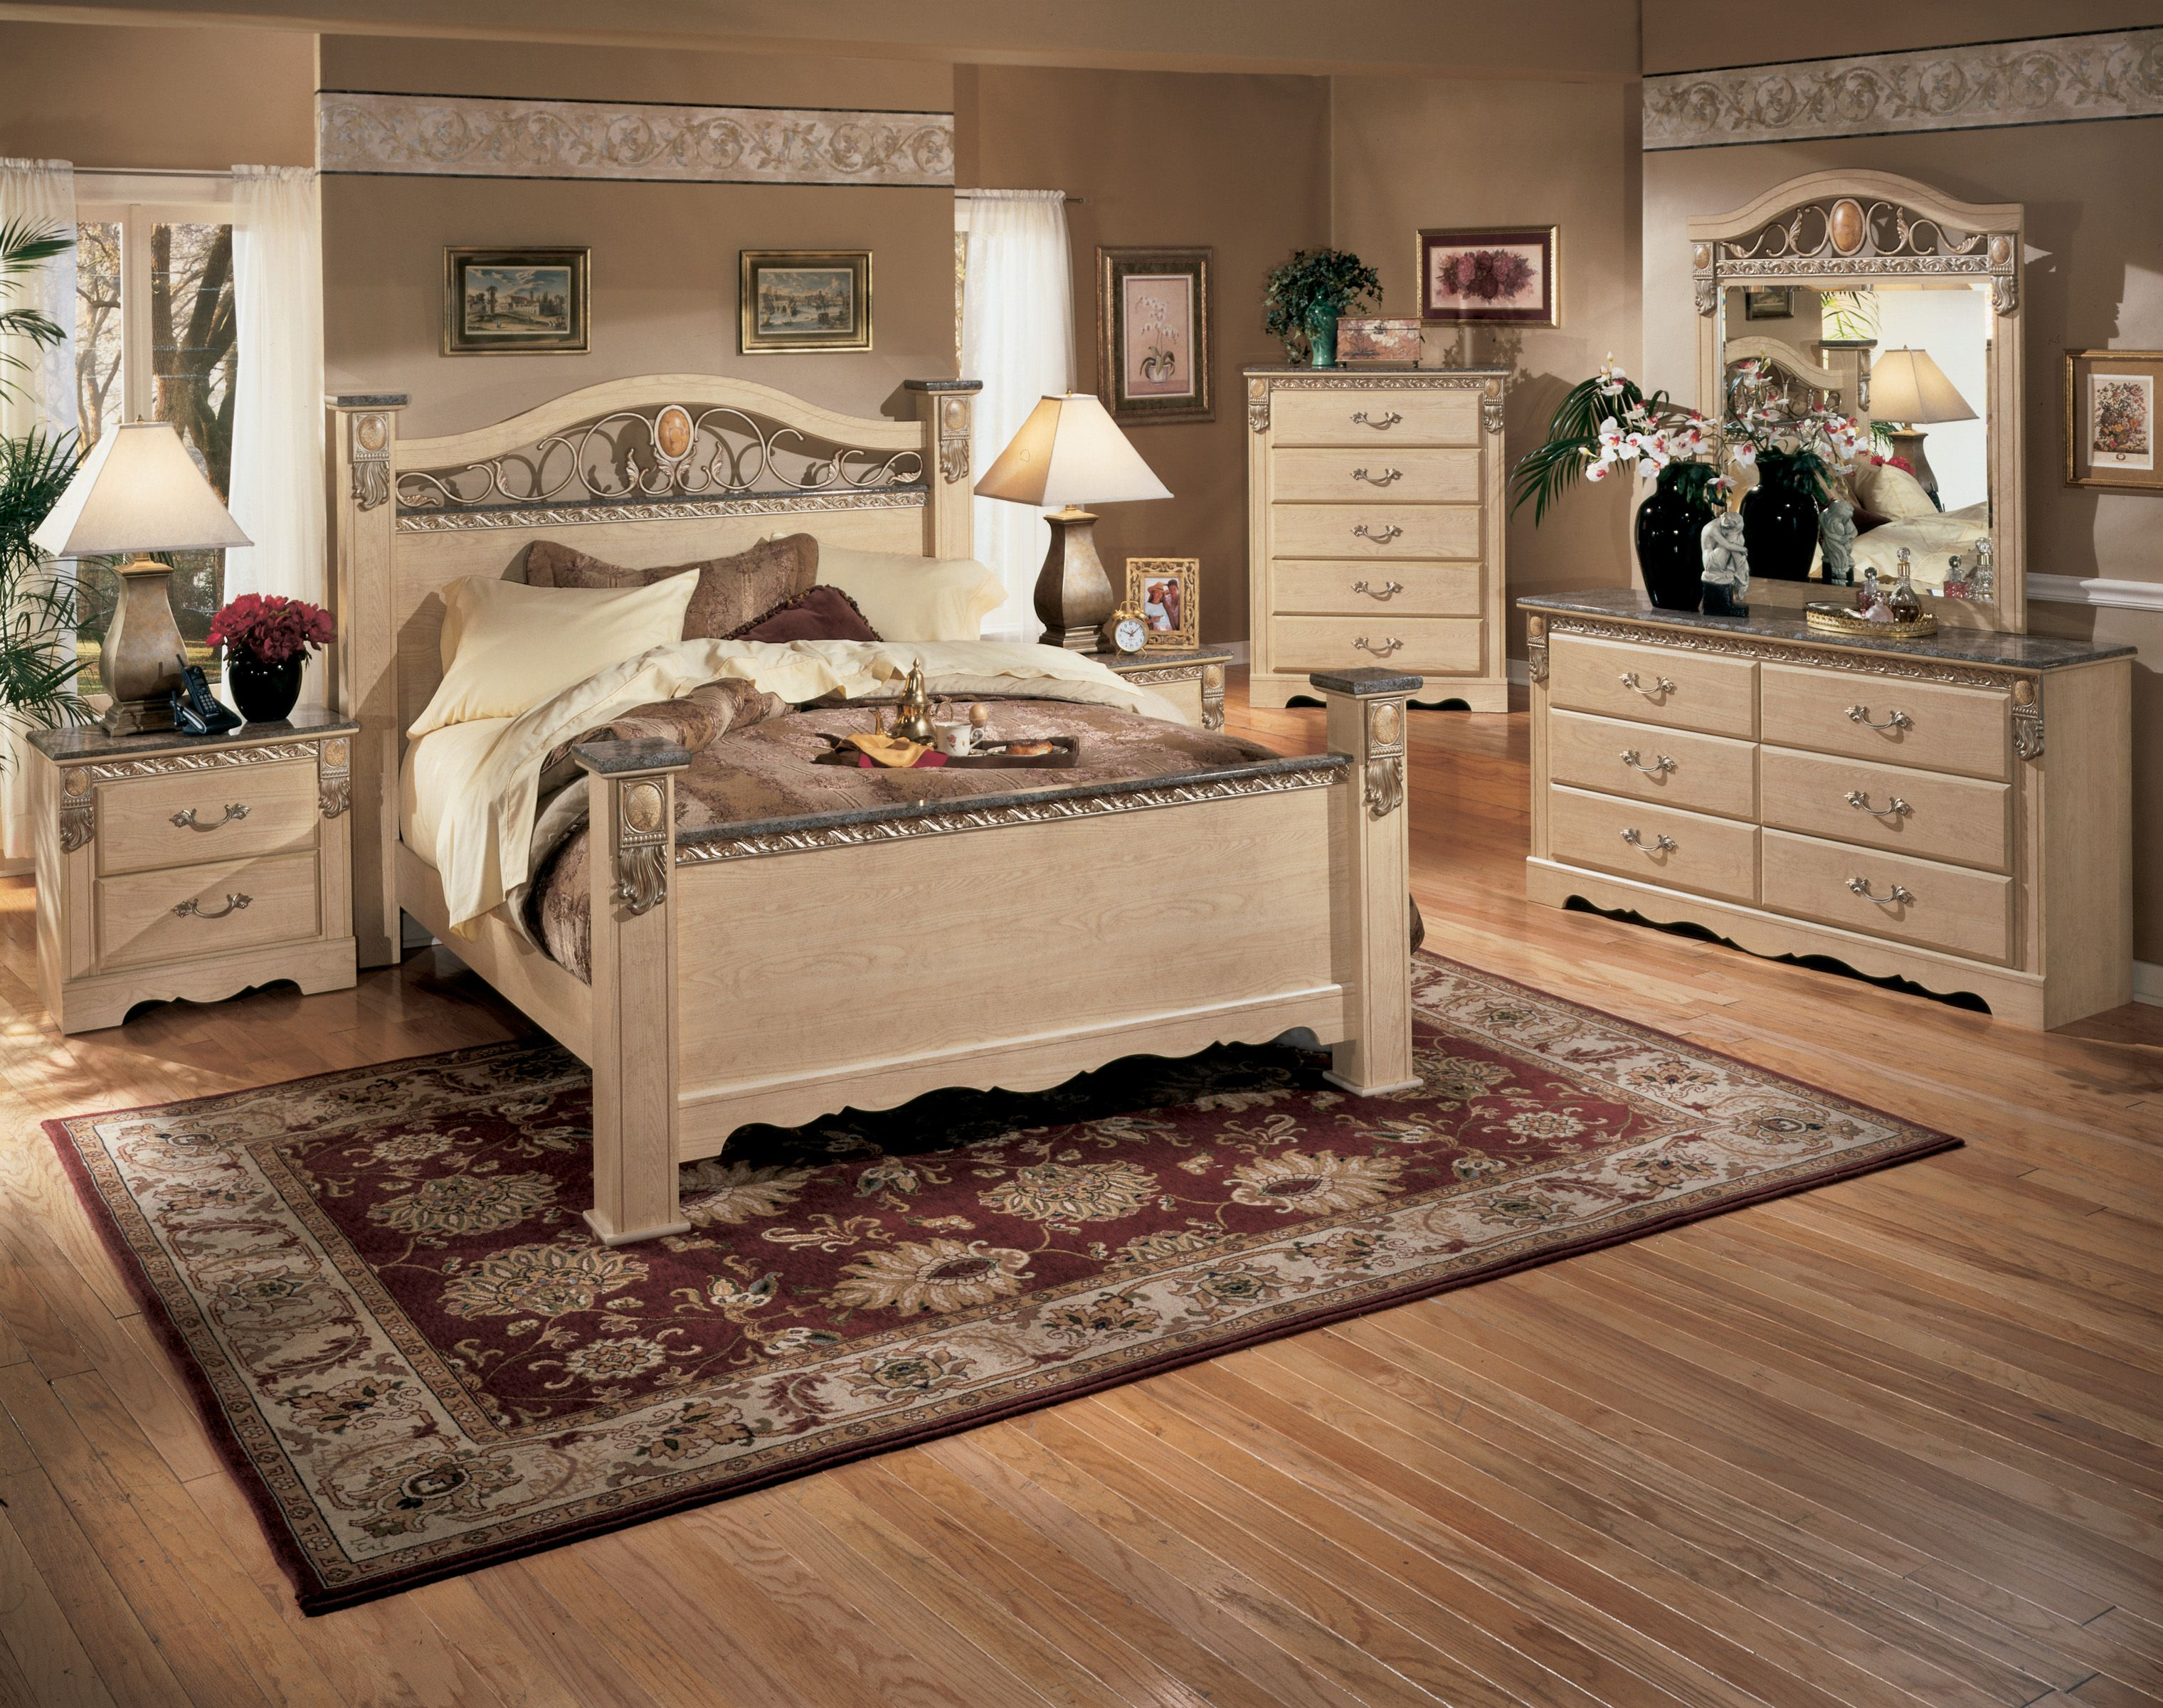 I Do Like The Cutout Parts Ashley Furniture Bedroom Light Oak